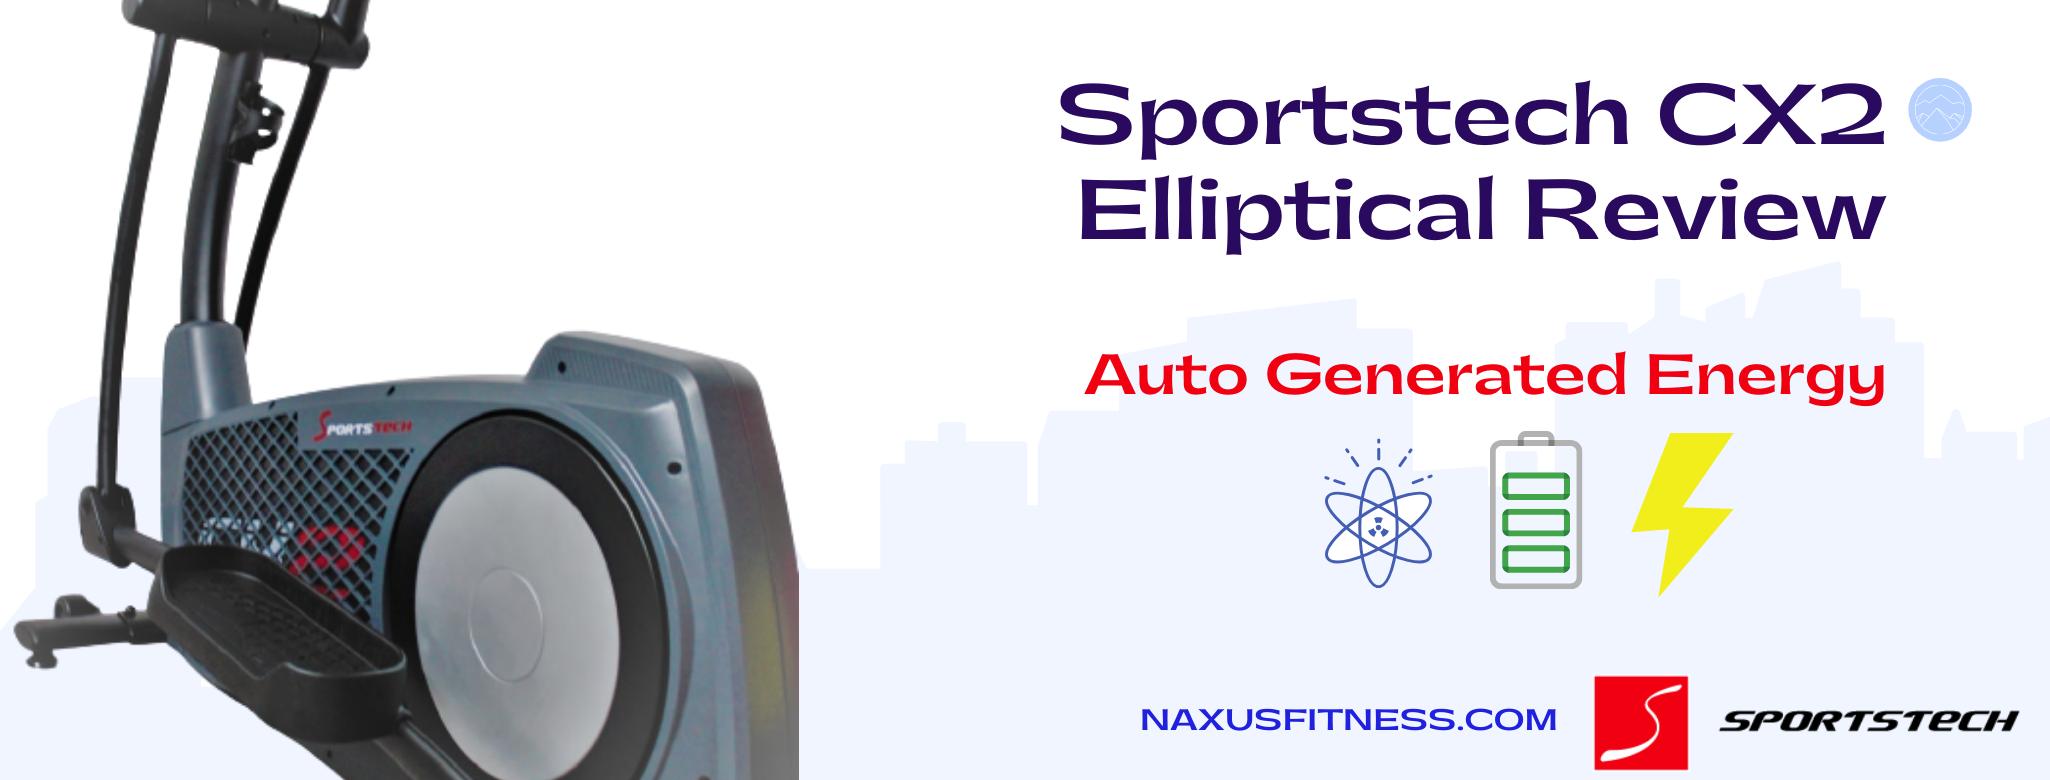 Sportstech CX2 Auto Generator